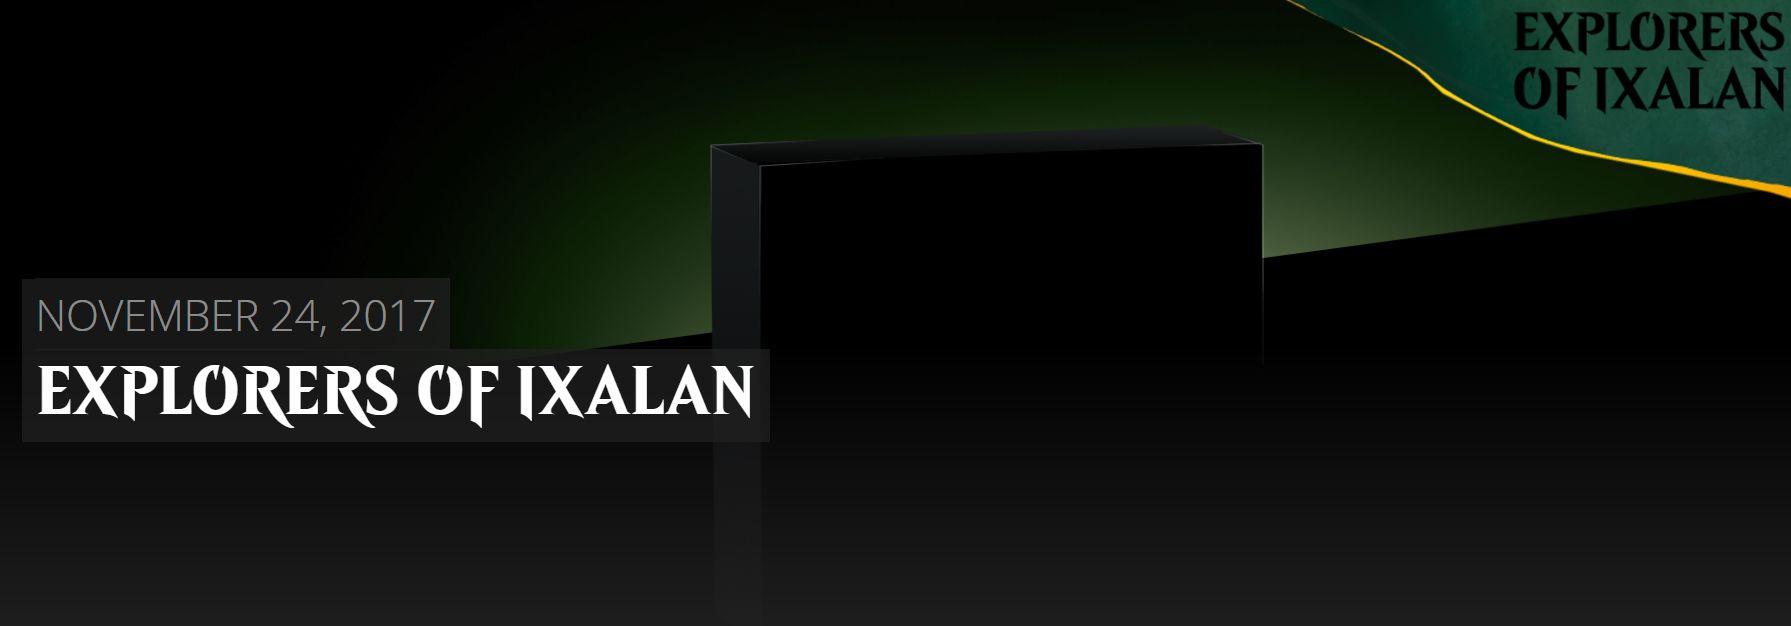 MTG「Explorers of Ixalan」をネット通販最安値で予約できるお店は?